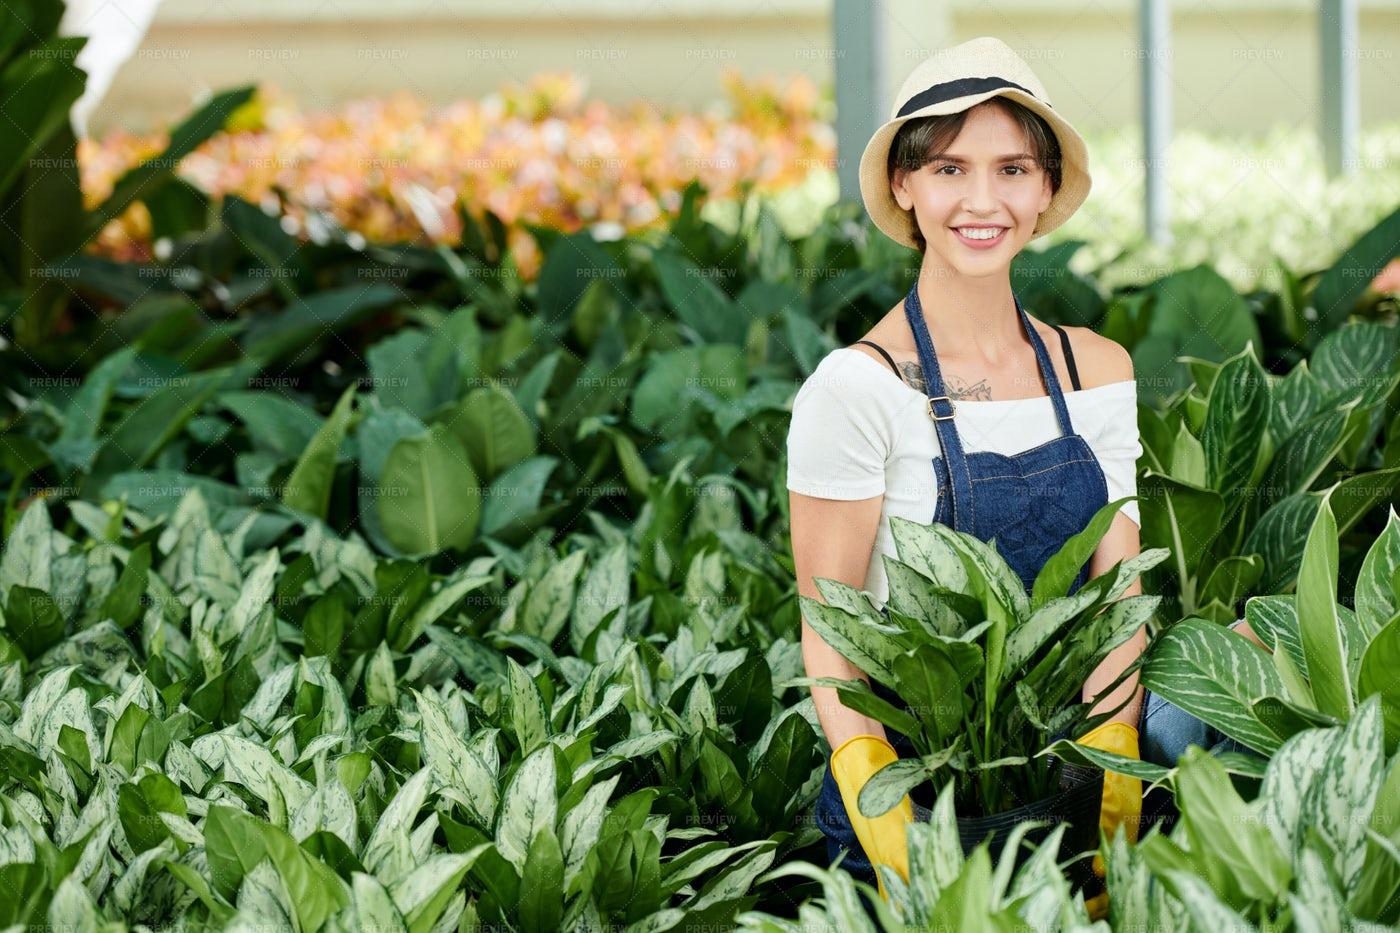 Female Gardener Planting Flowers: Stock Photos